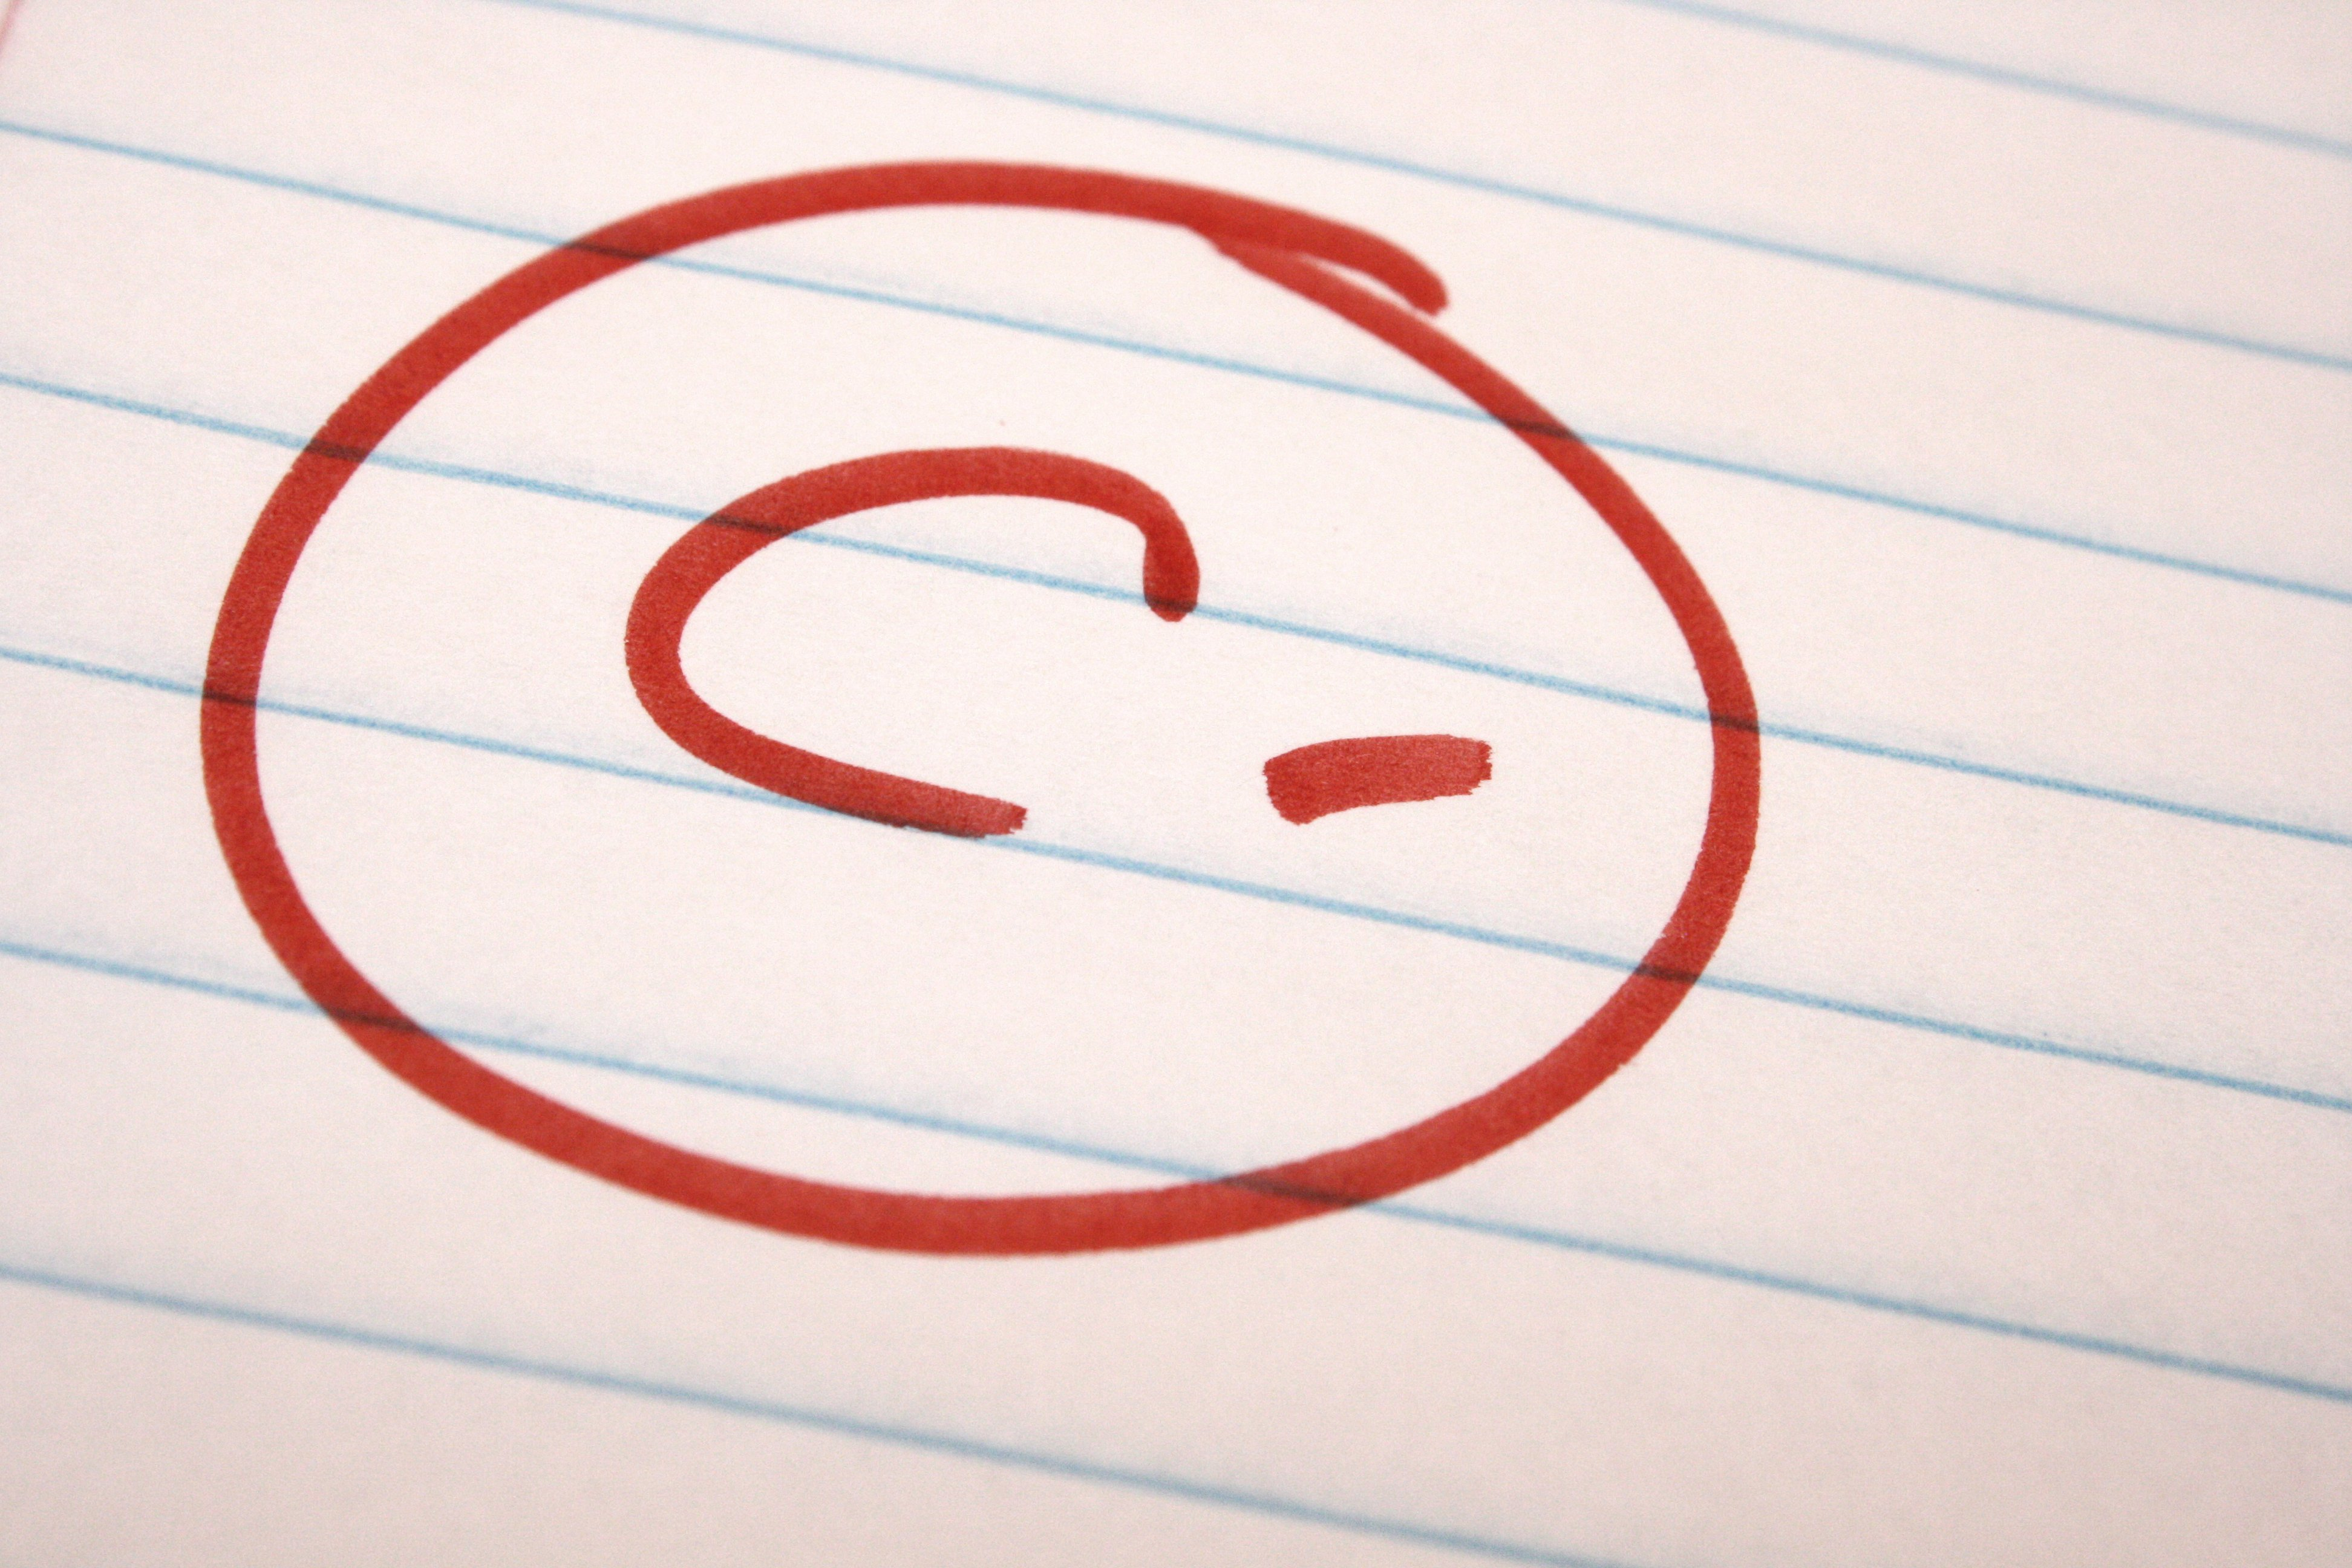 School Letter Grades c Minus School Letter Grade